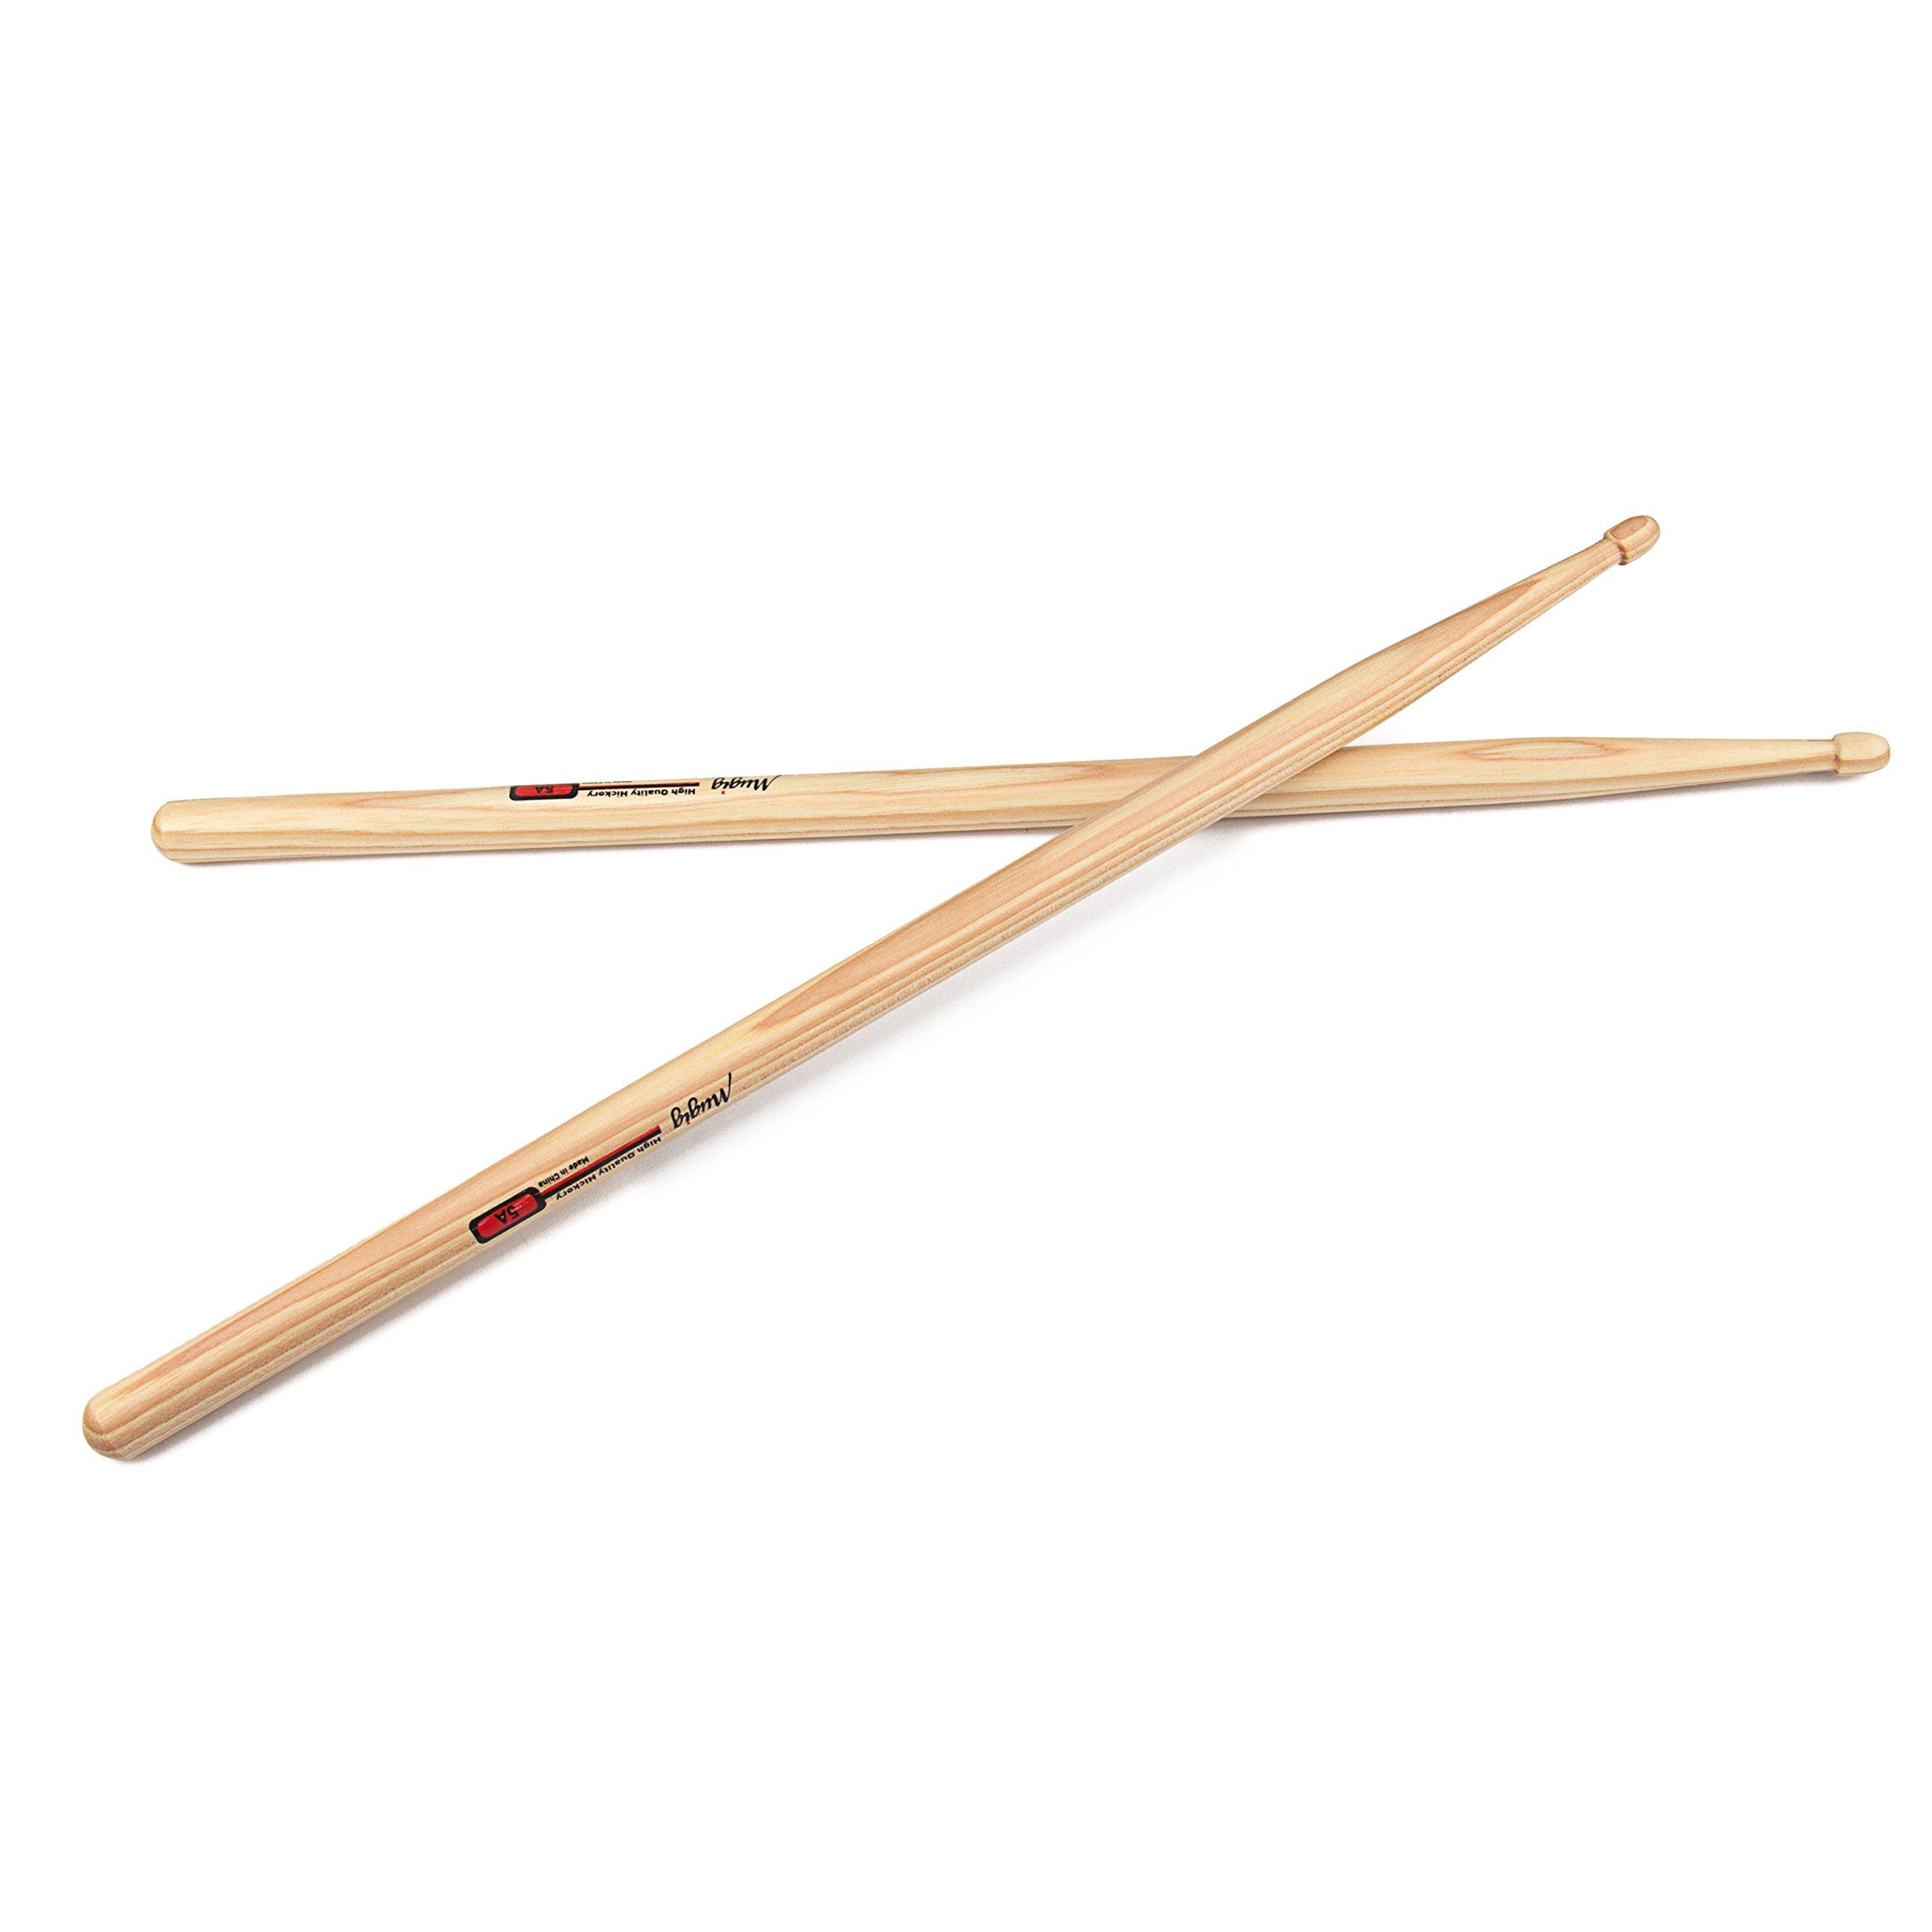 Mugig Drum Sticks Hickory Rock Sticks for Jazz Pop Rock Music (3 Pairs)